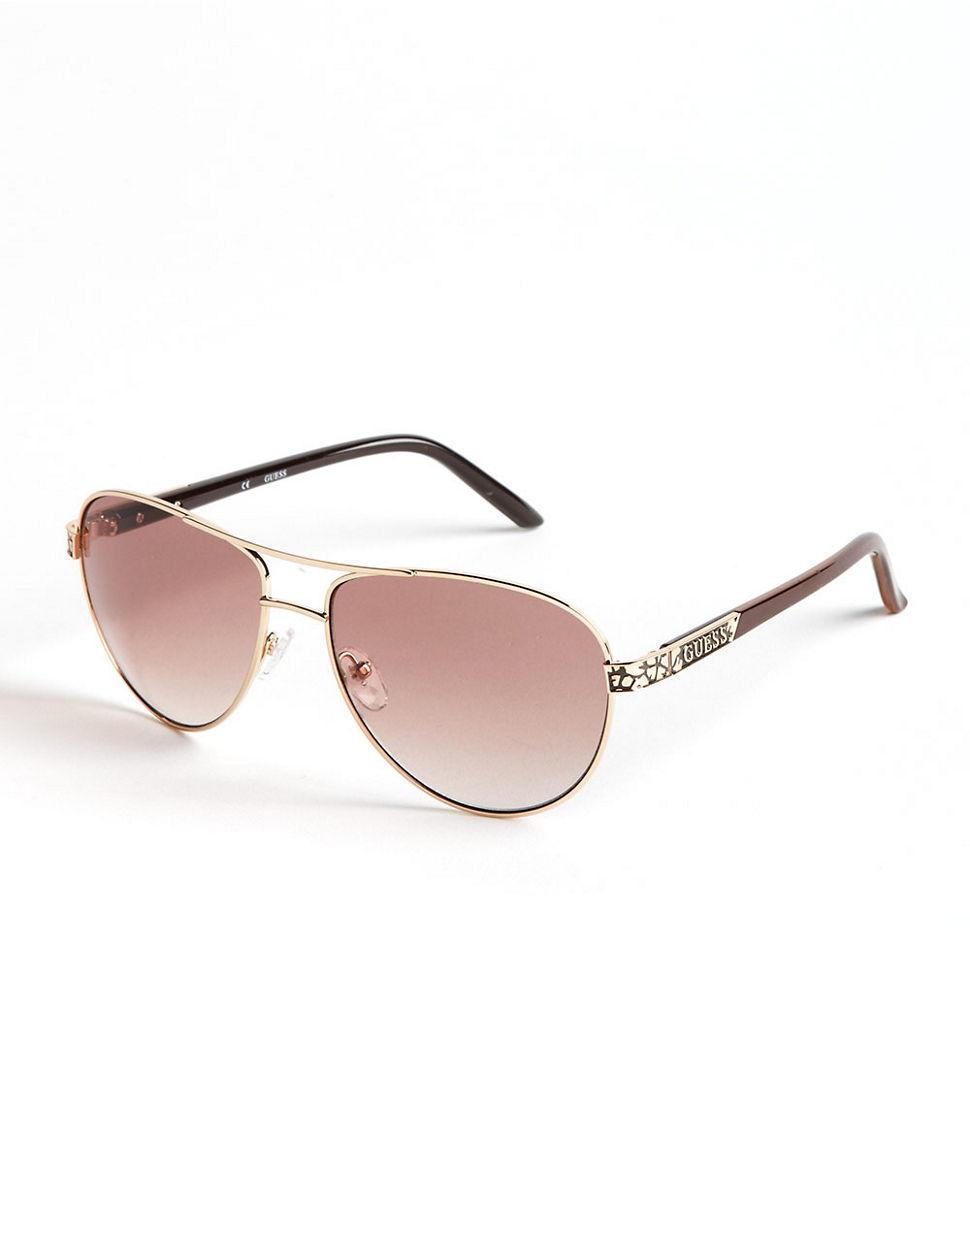 Guess Aviator Sunglasses in Metallic for Men - Lyst 53ea890129